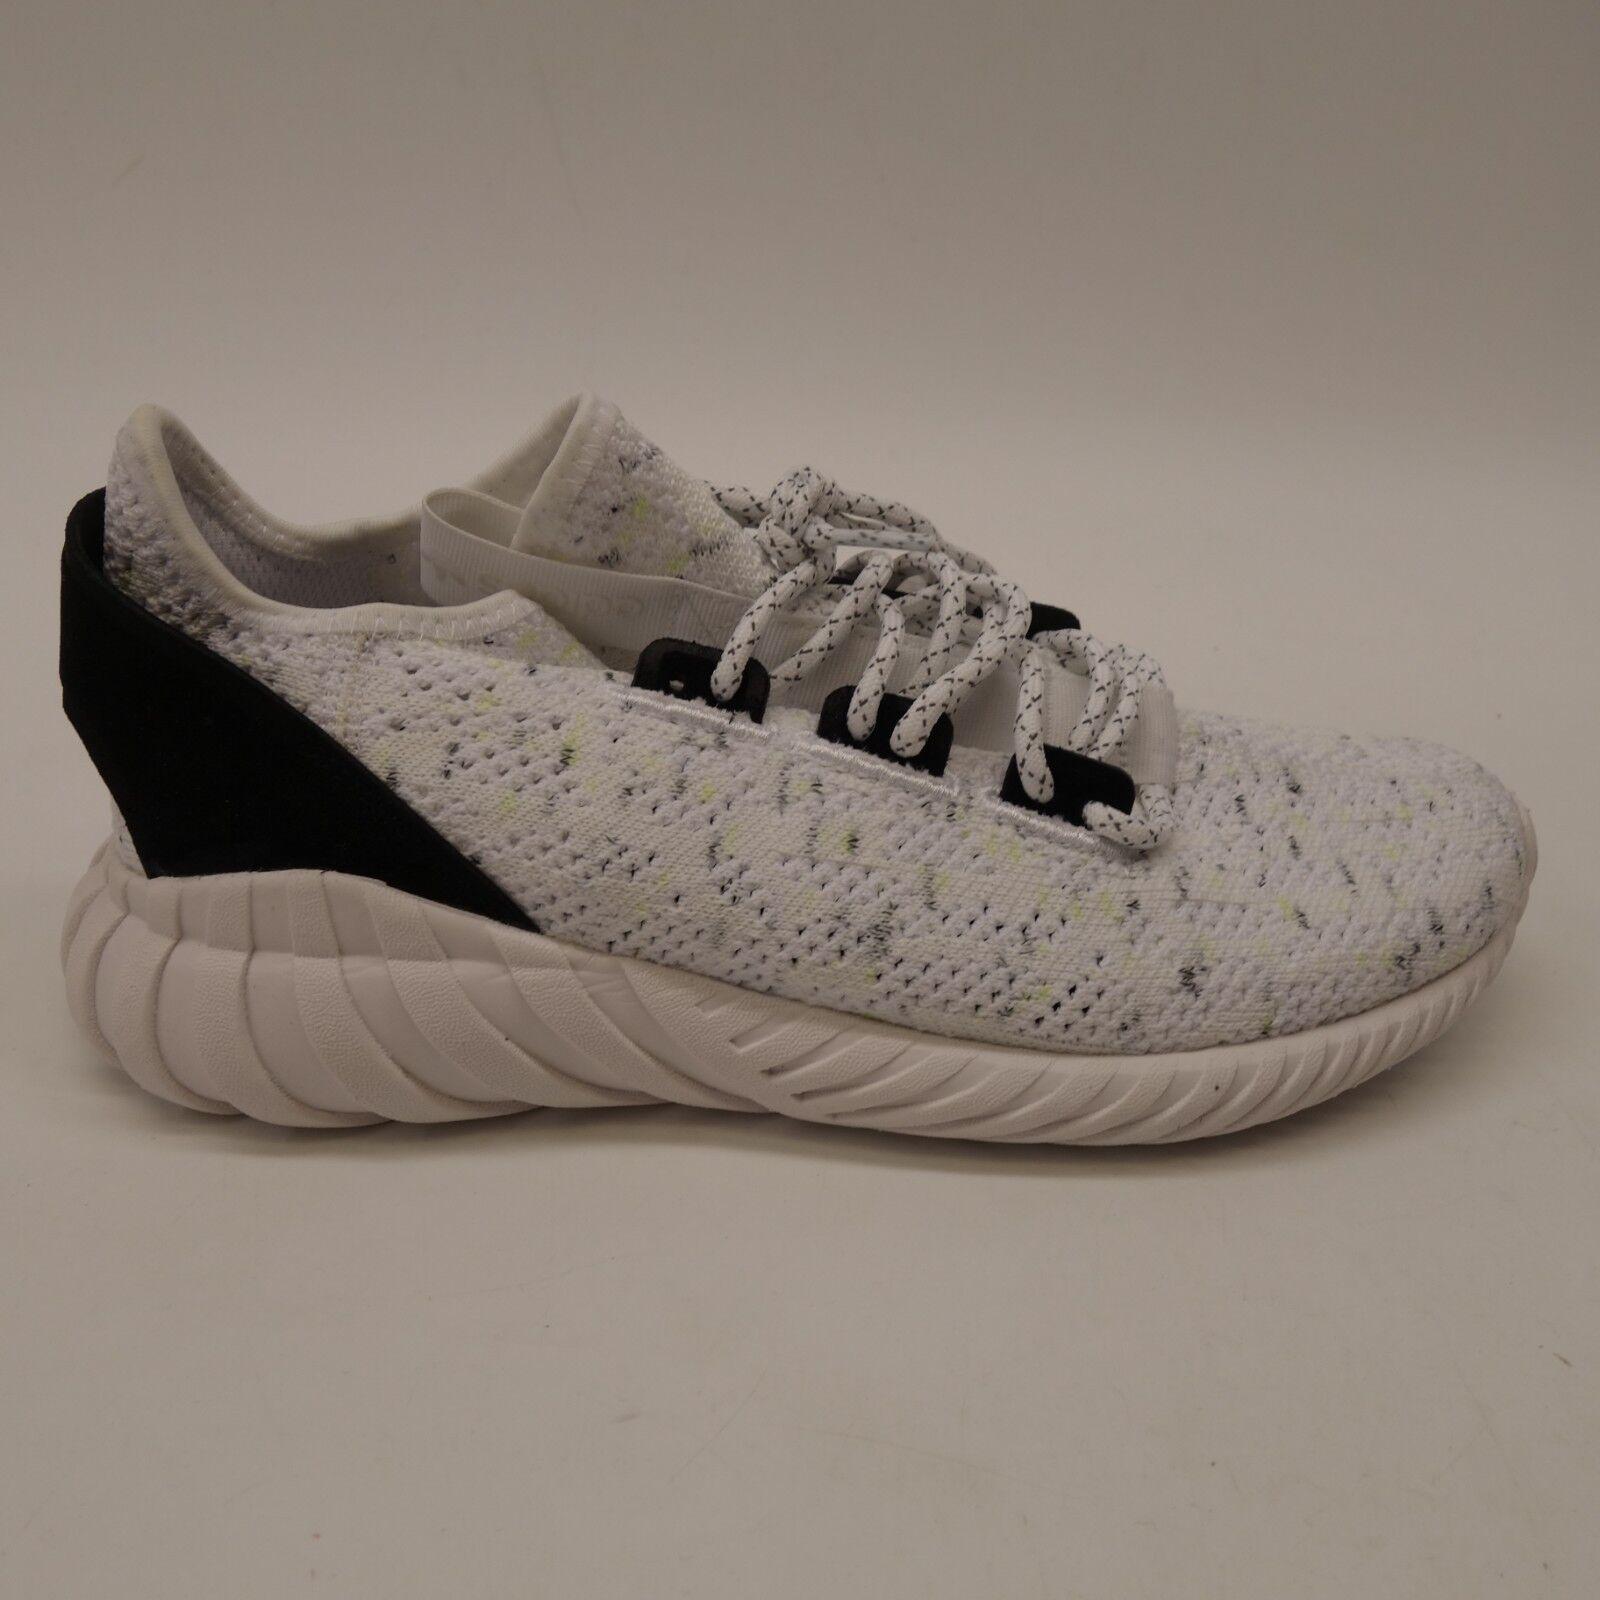 New Adidas Mens BY3558 Tubular Doom Sock White Primeknit Athletic shoes Size 7.5